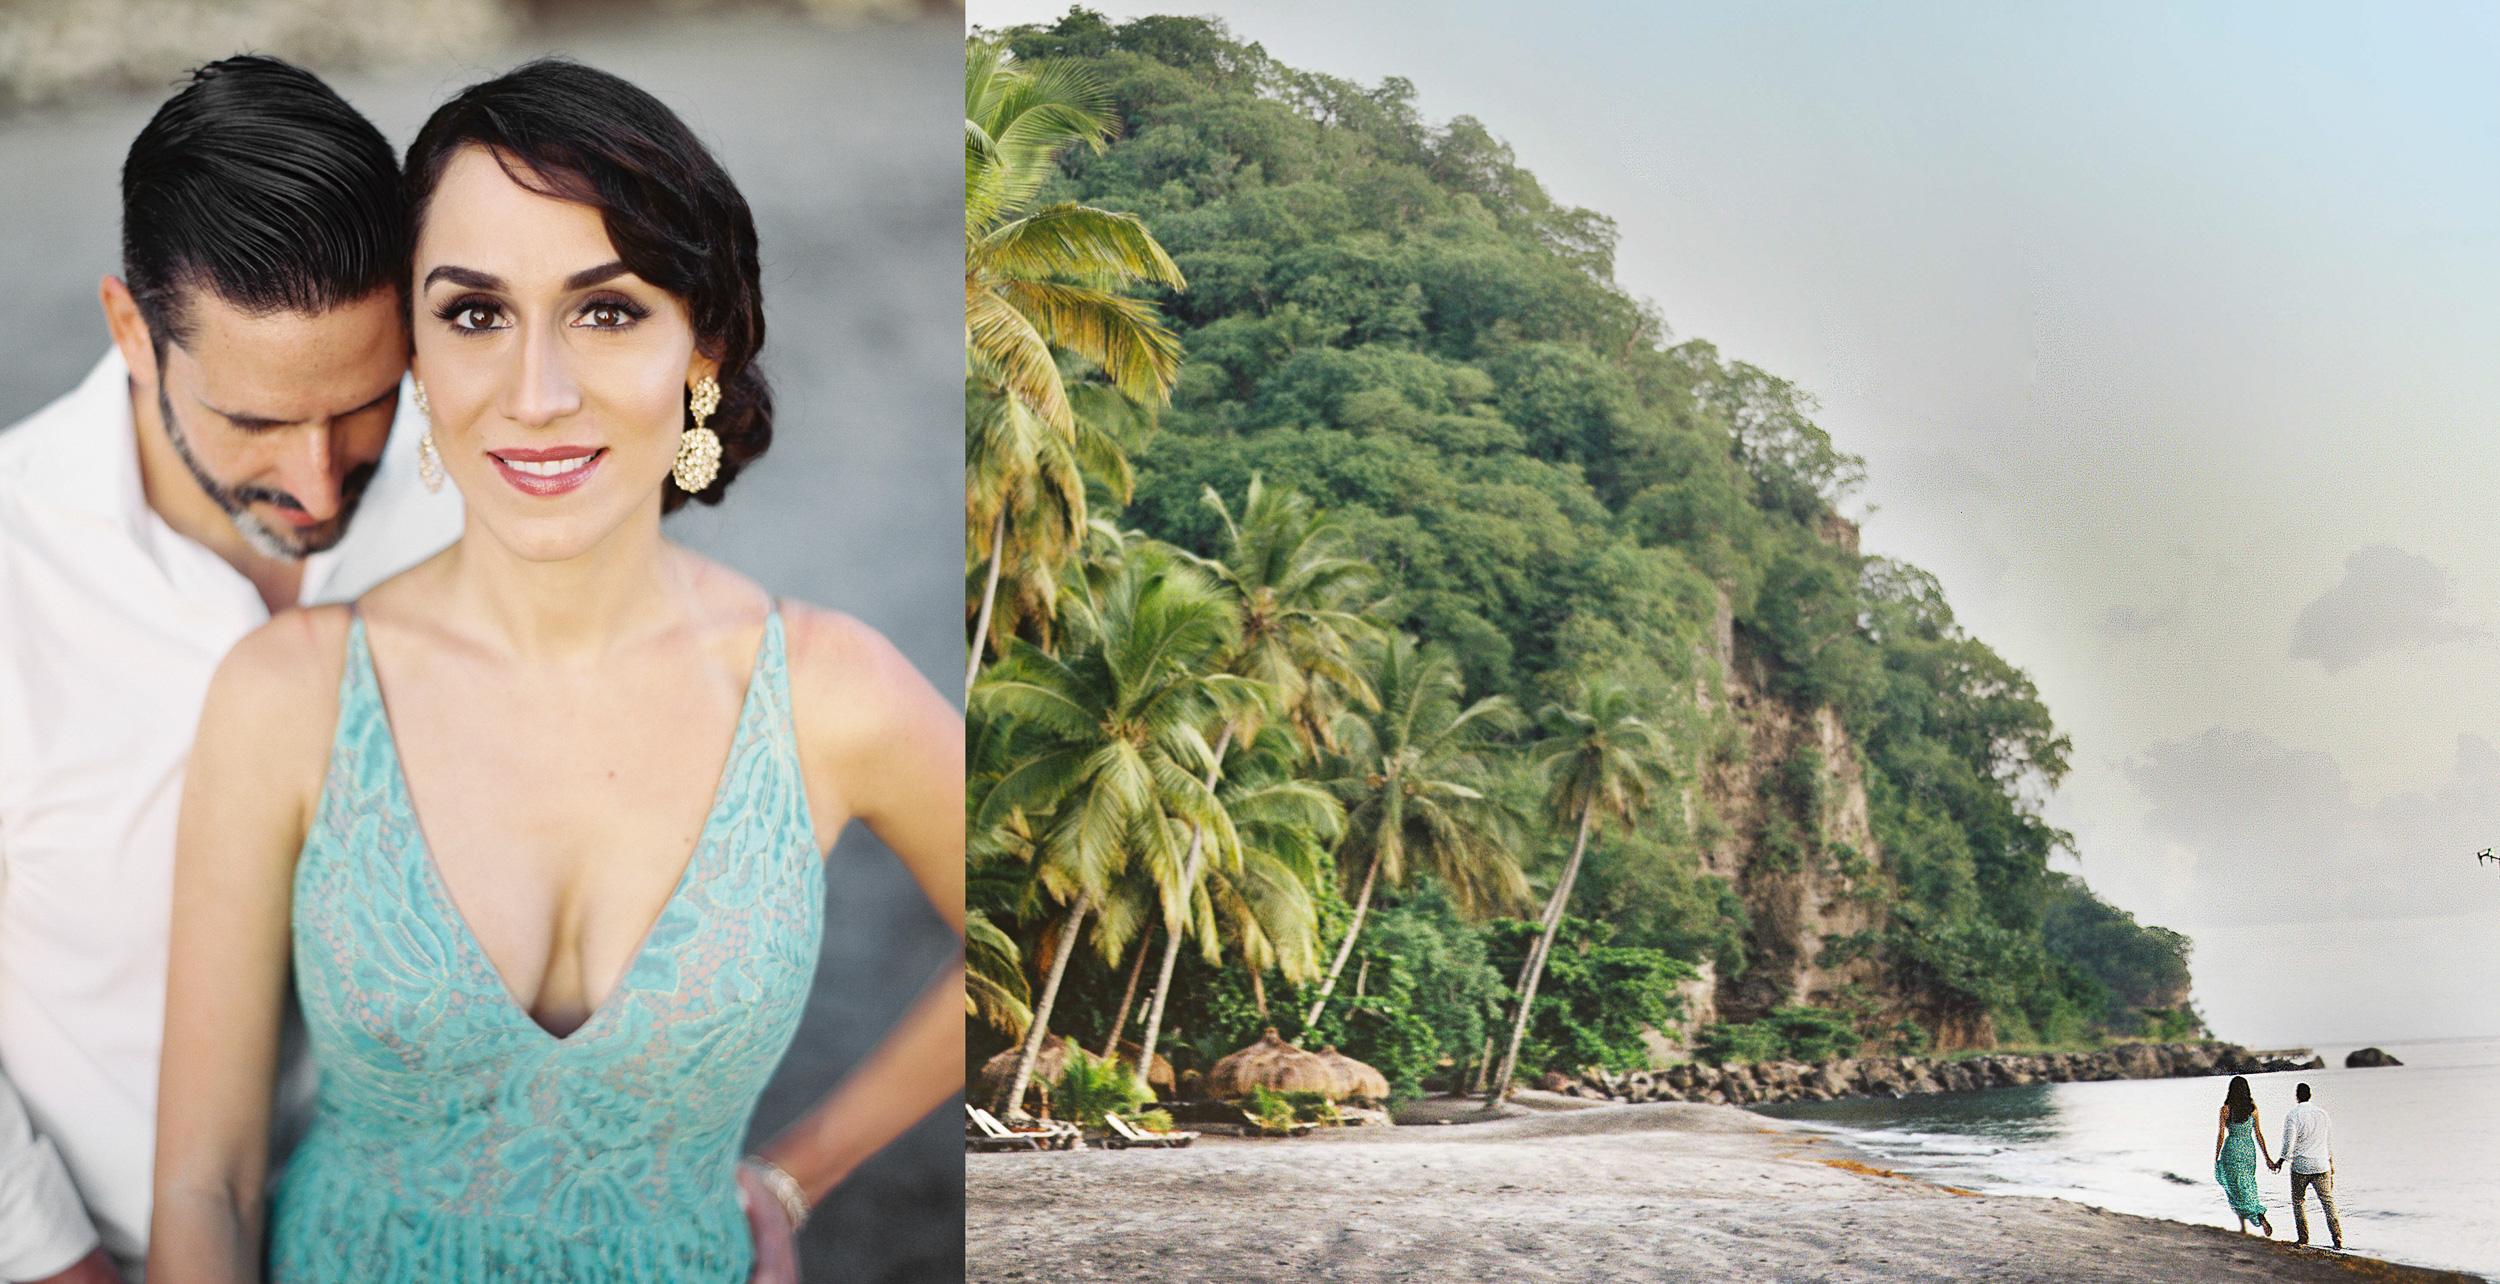 06_best+wedding+photographer+videographer+luxury+weddings+elopements_.jpg